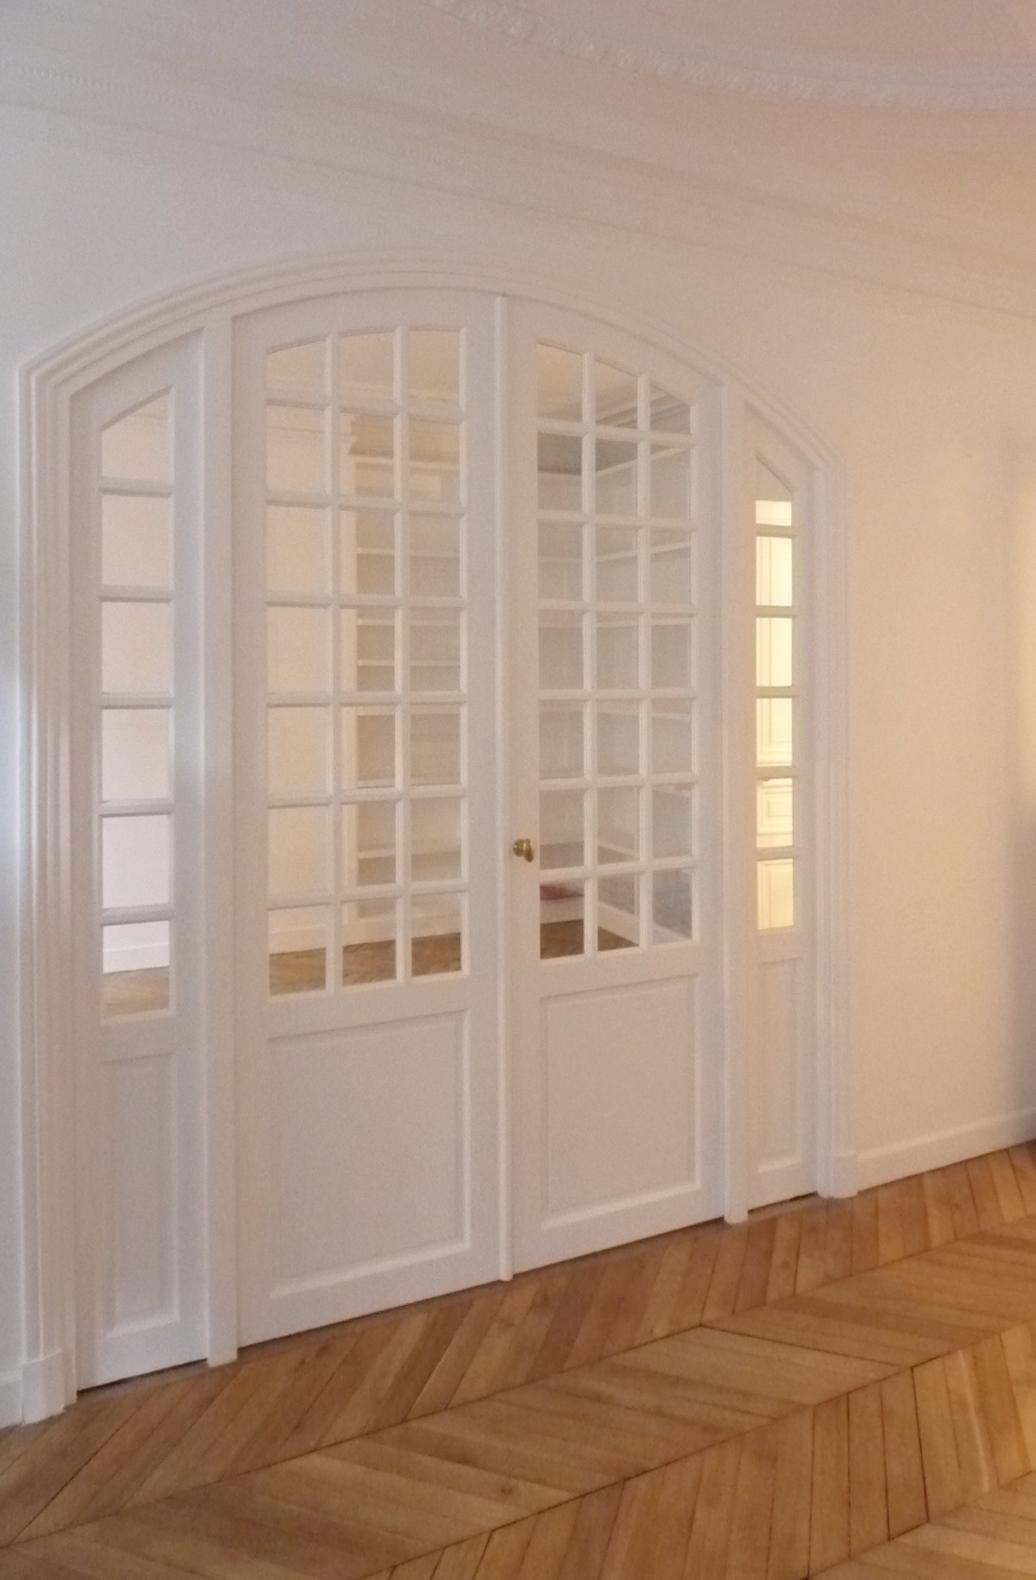 relooker une porte vitr e relooker porte interieure relooker une porte dans un esprit. Black Bedroom Furniture Sets. Home Design Ideas